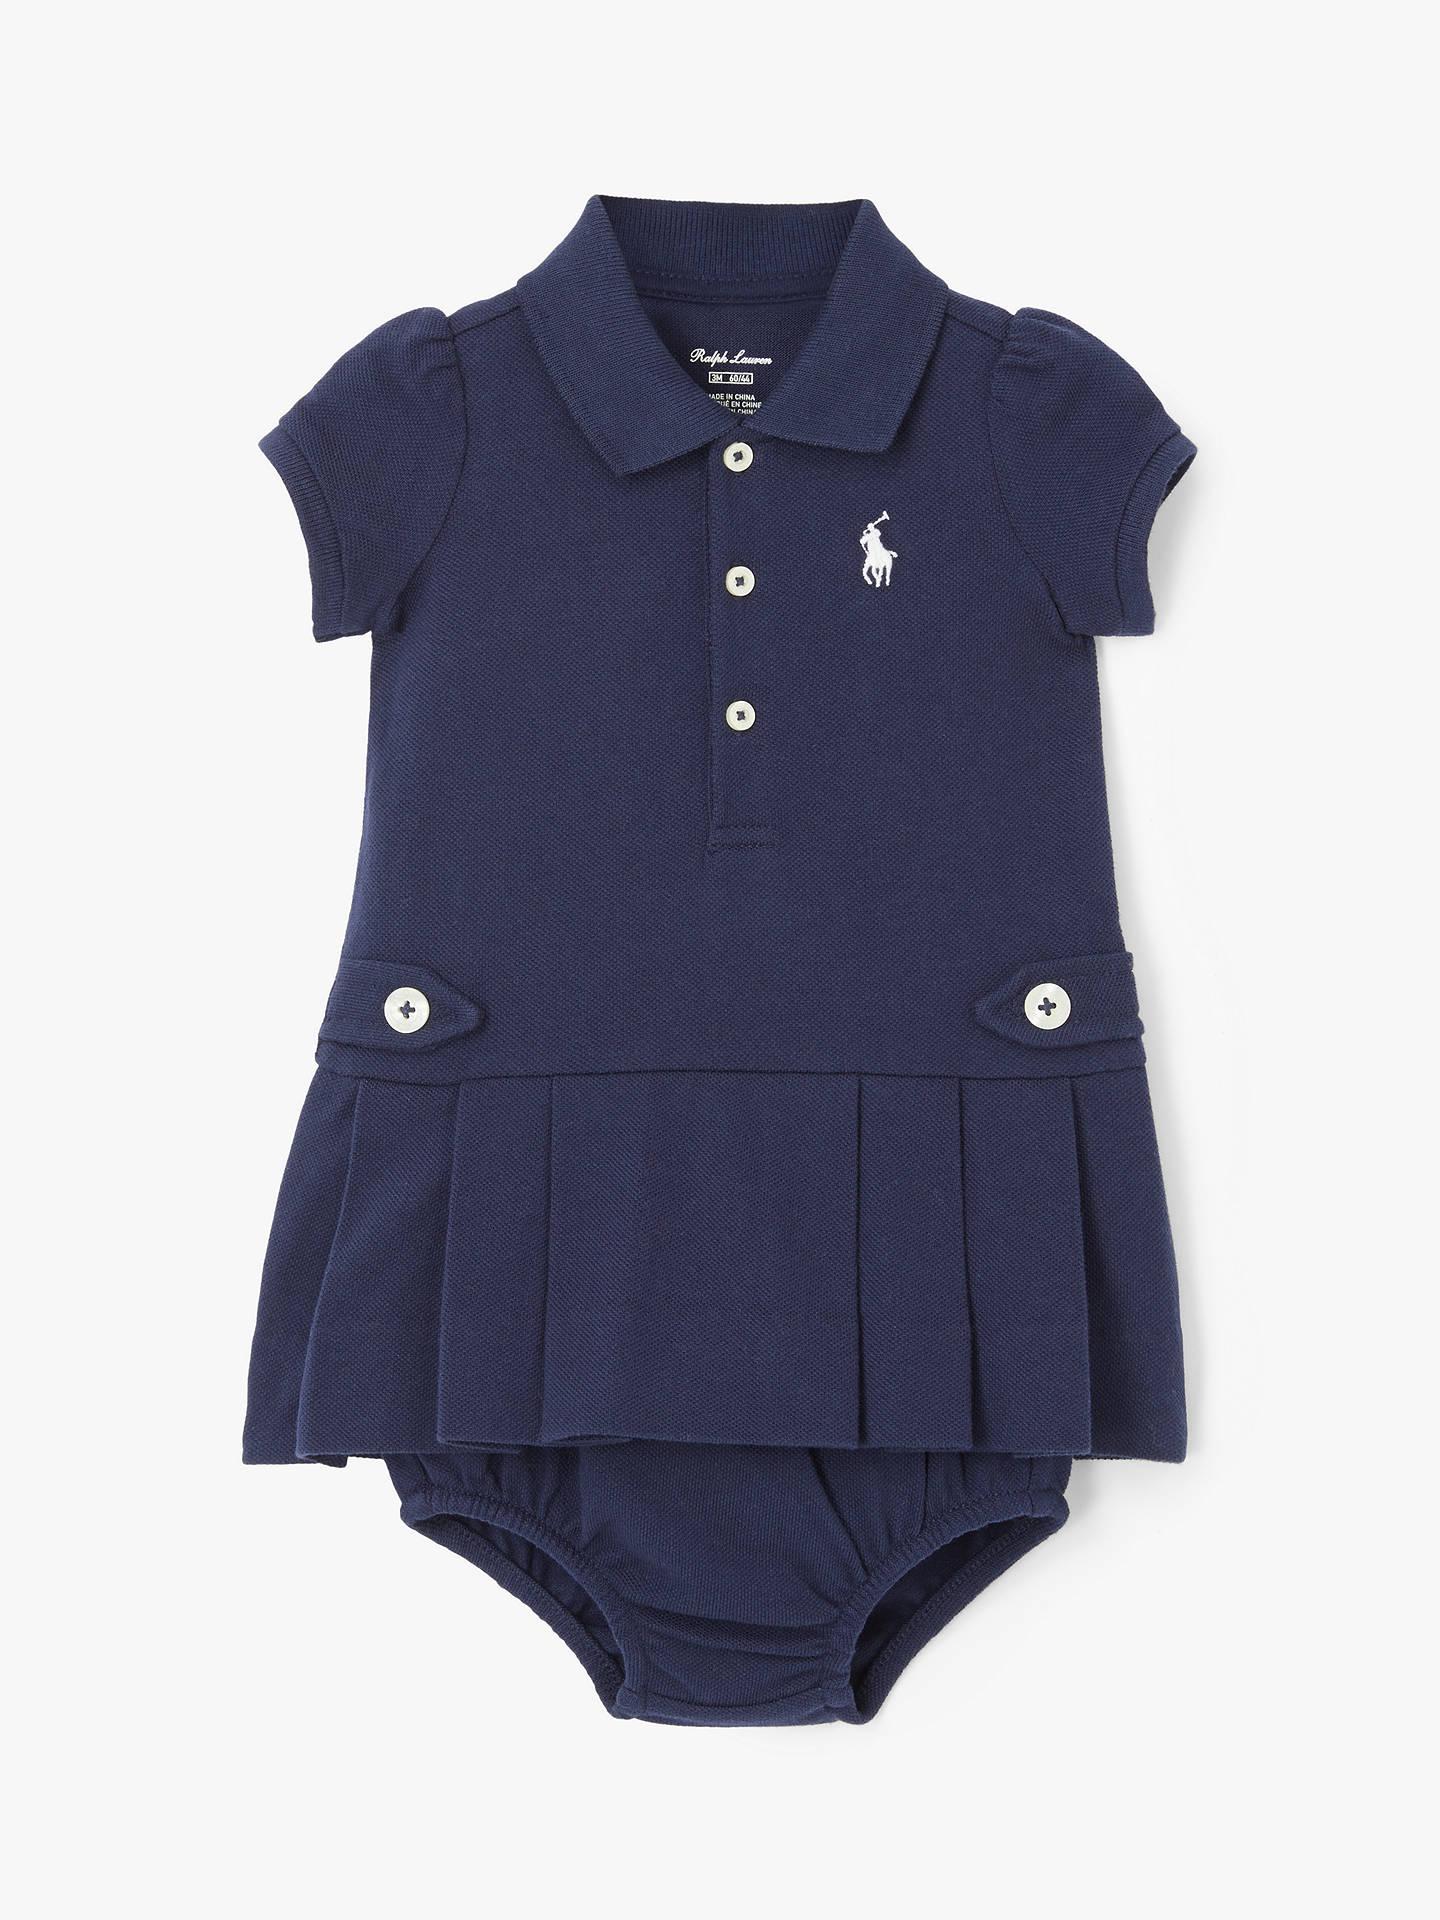 b02bac33e1 Polo Ralph Lauren Baby Polo Dress, Navy